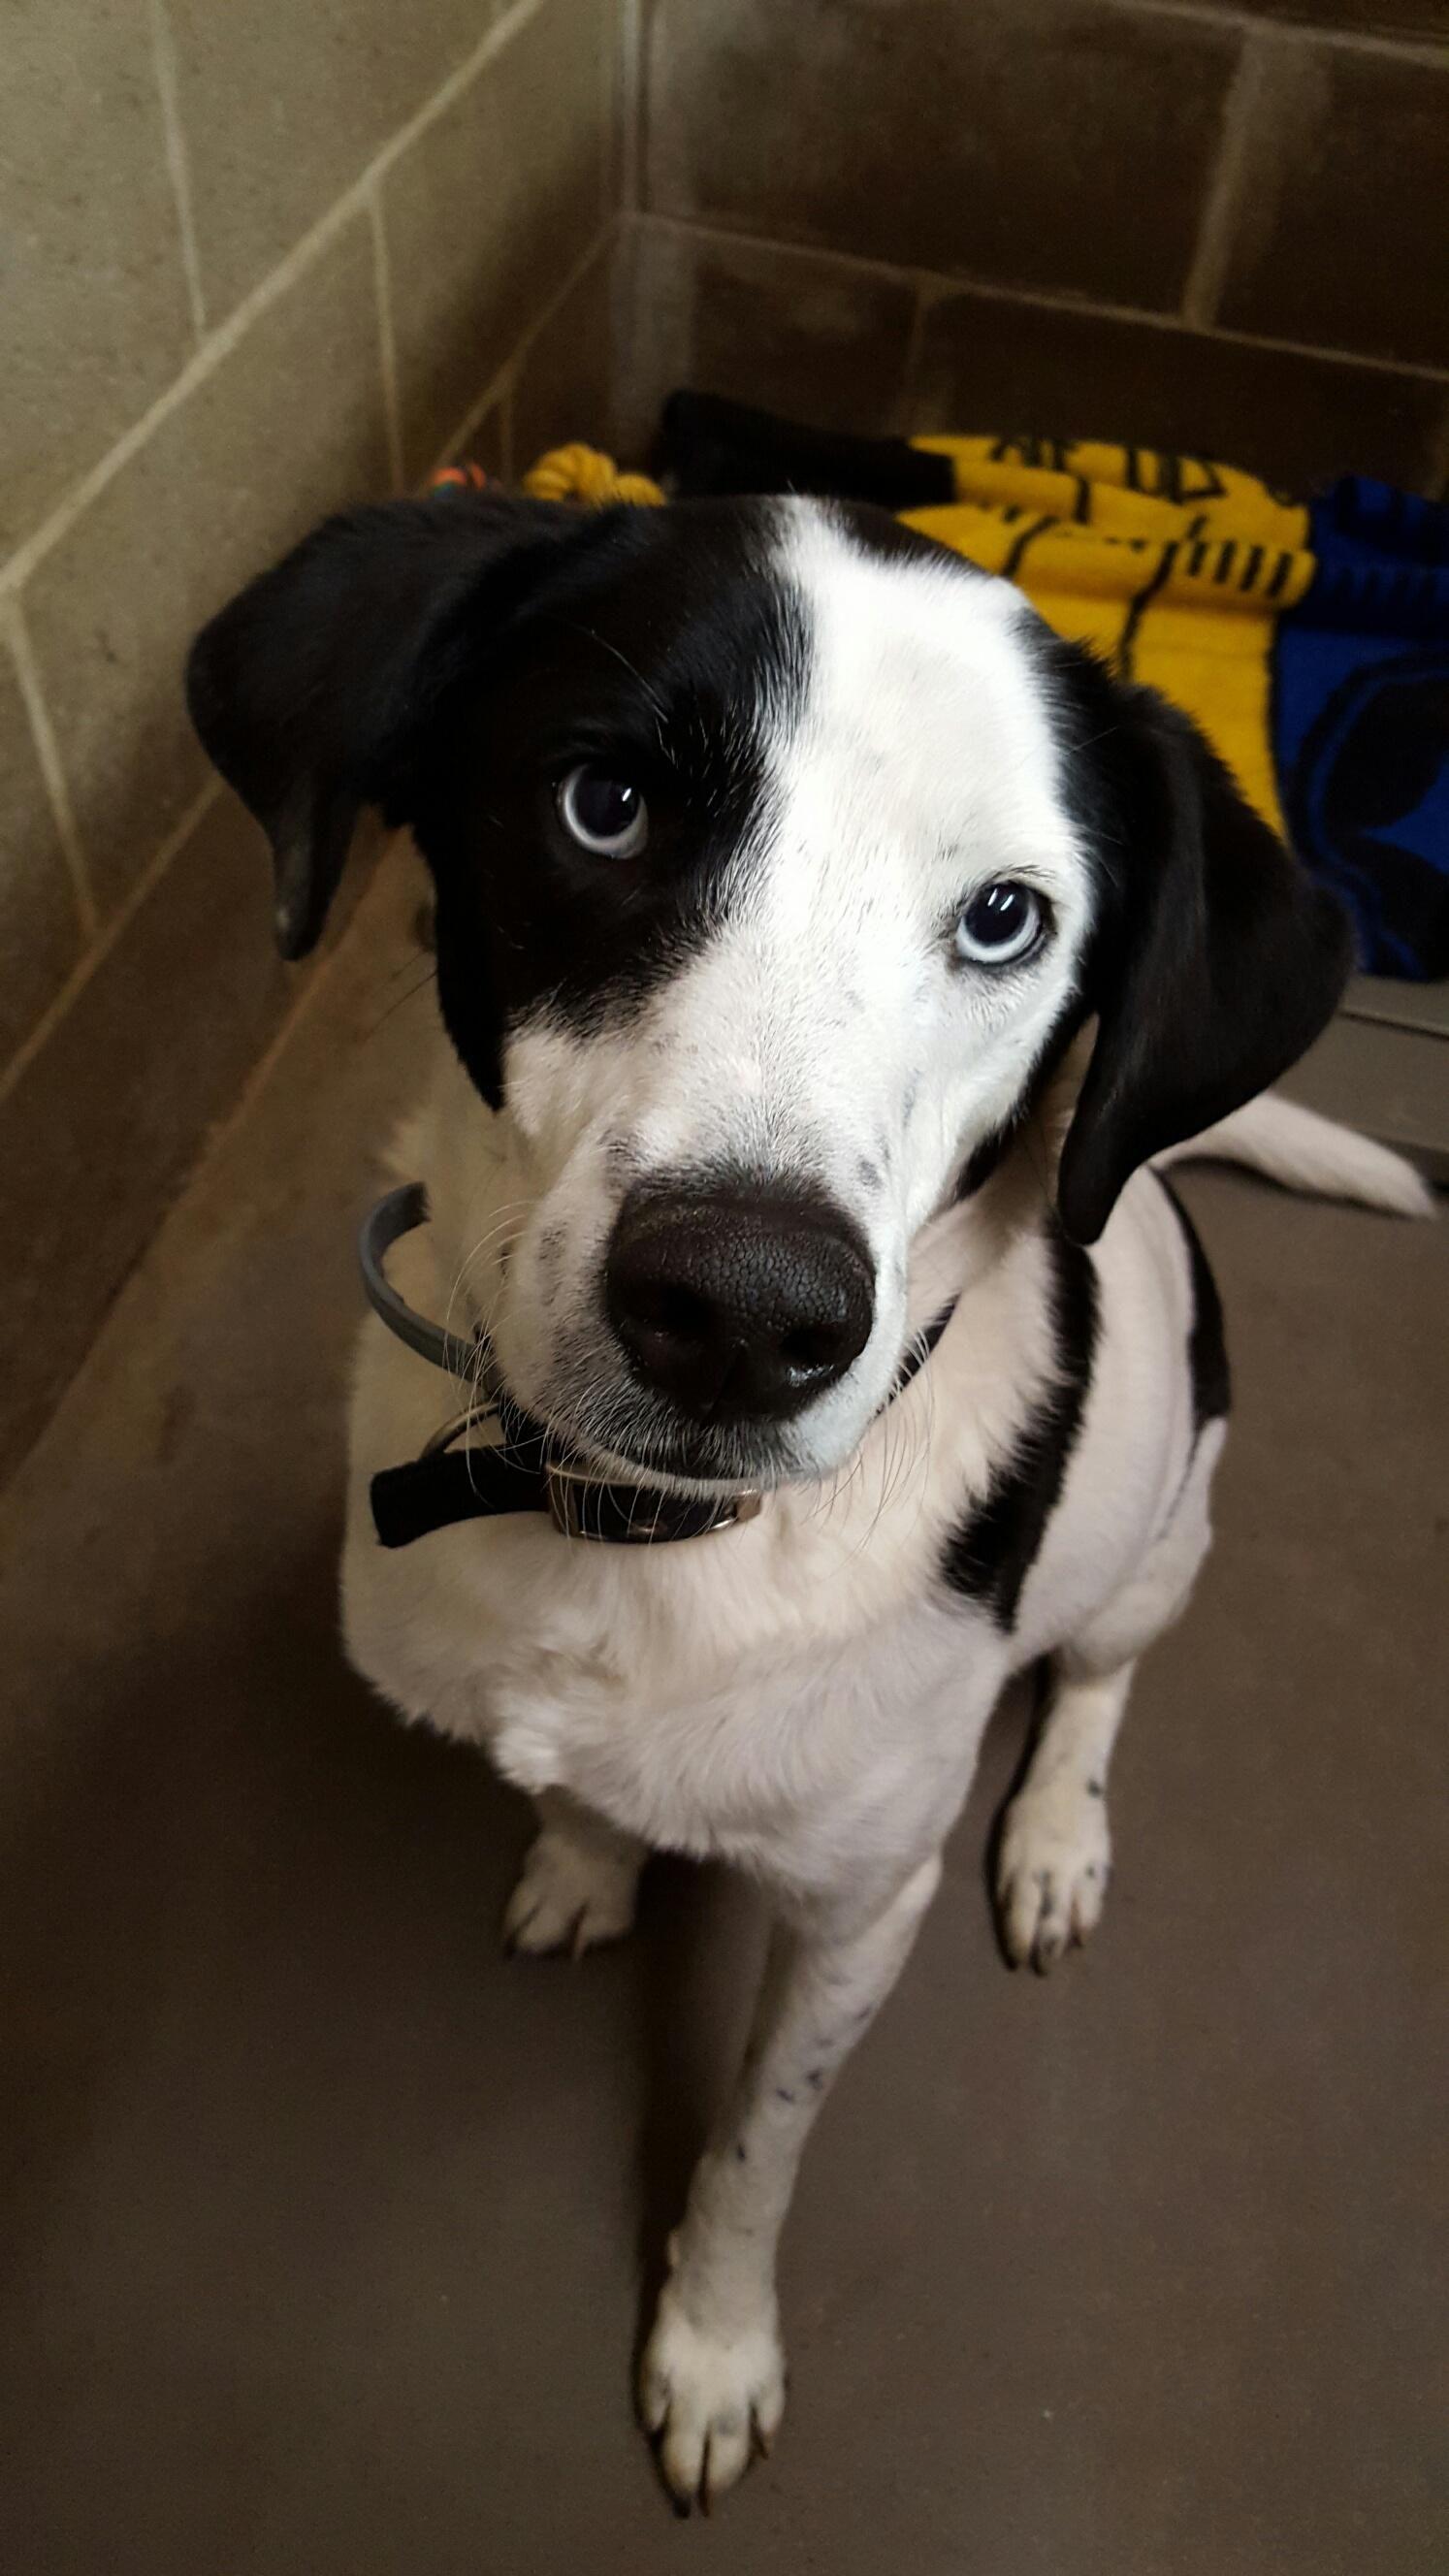 White Oak, PA Meet Mike, an adoptable Border Collie